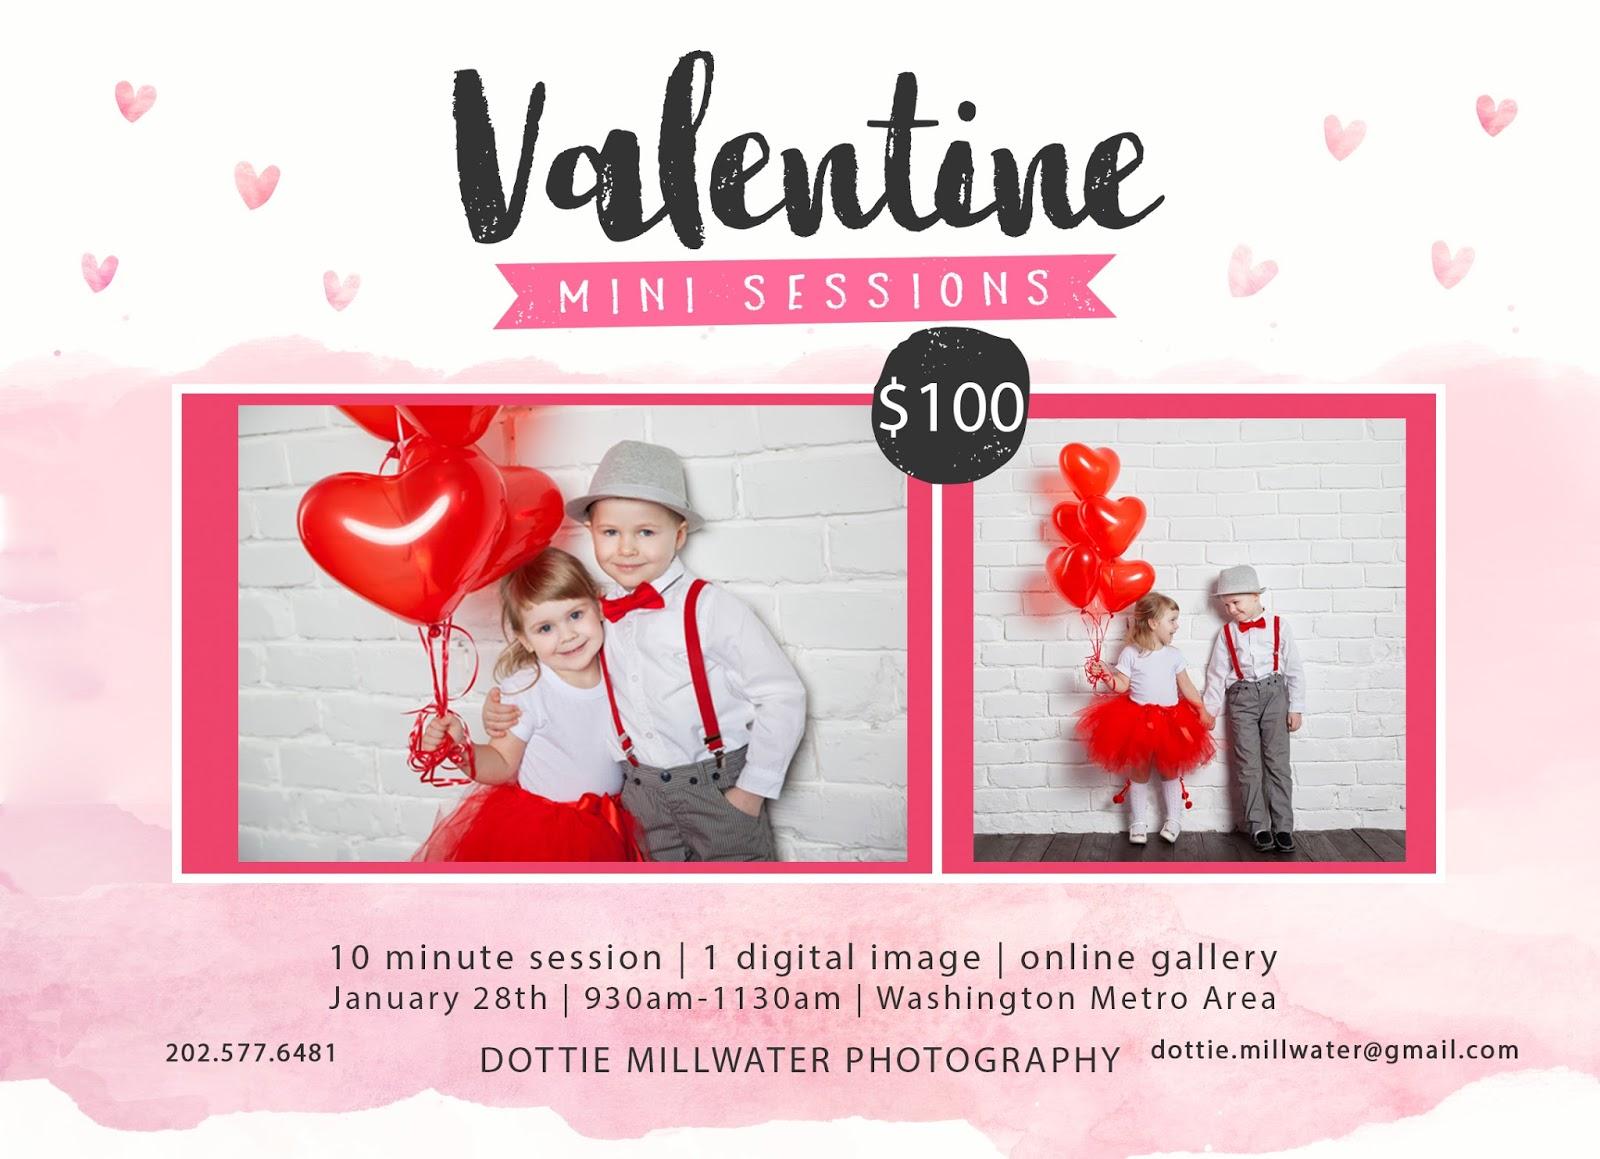 washington dc valentines day mini session - Valentines Day In Dc